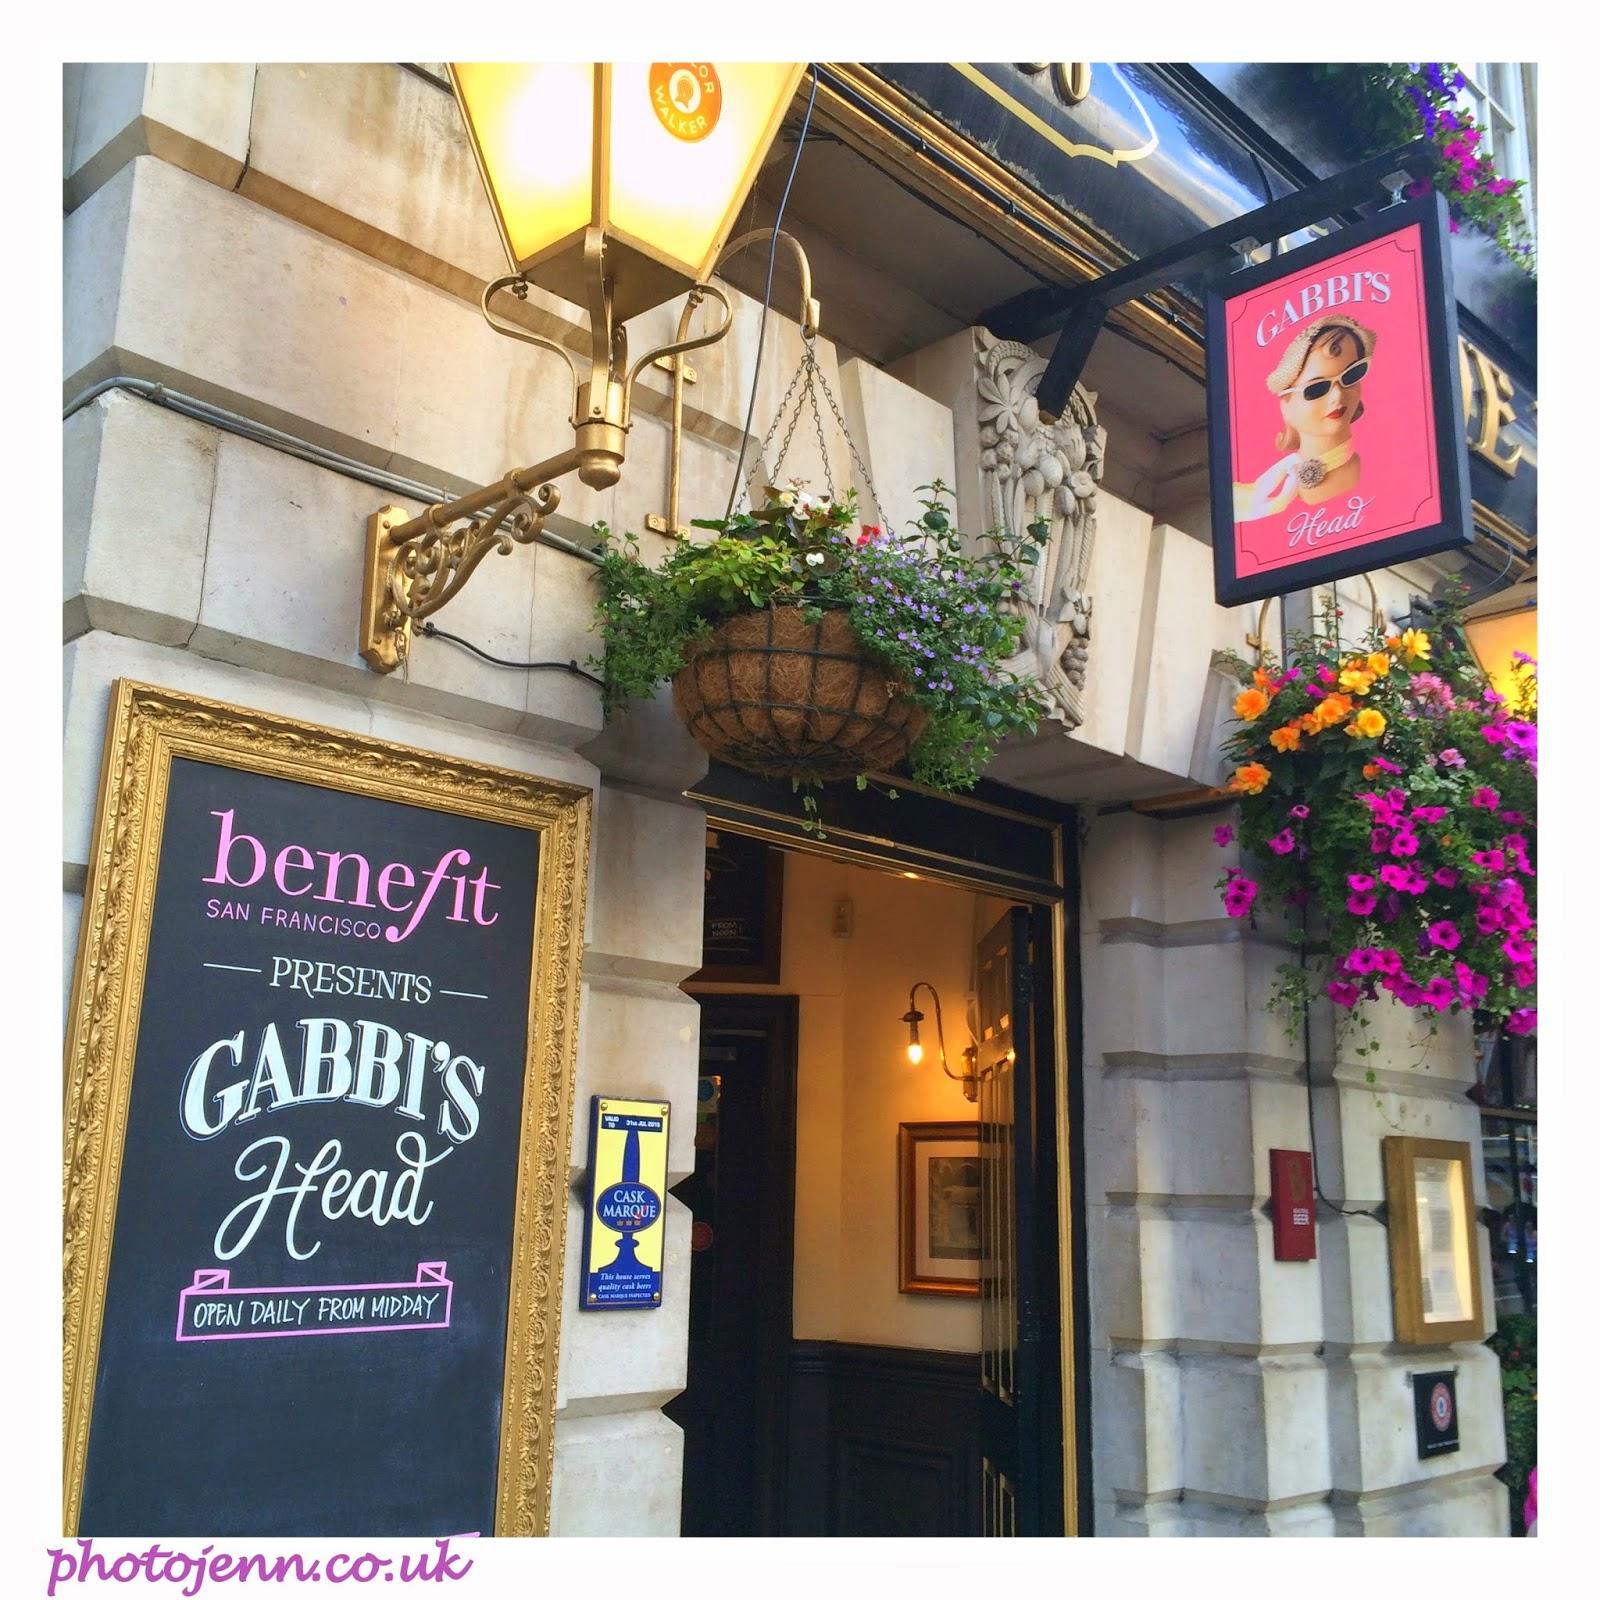 gabbis-head-covent-garden-london-reveiw